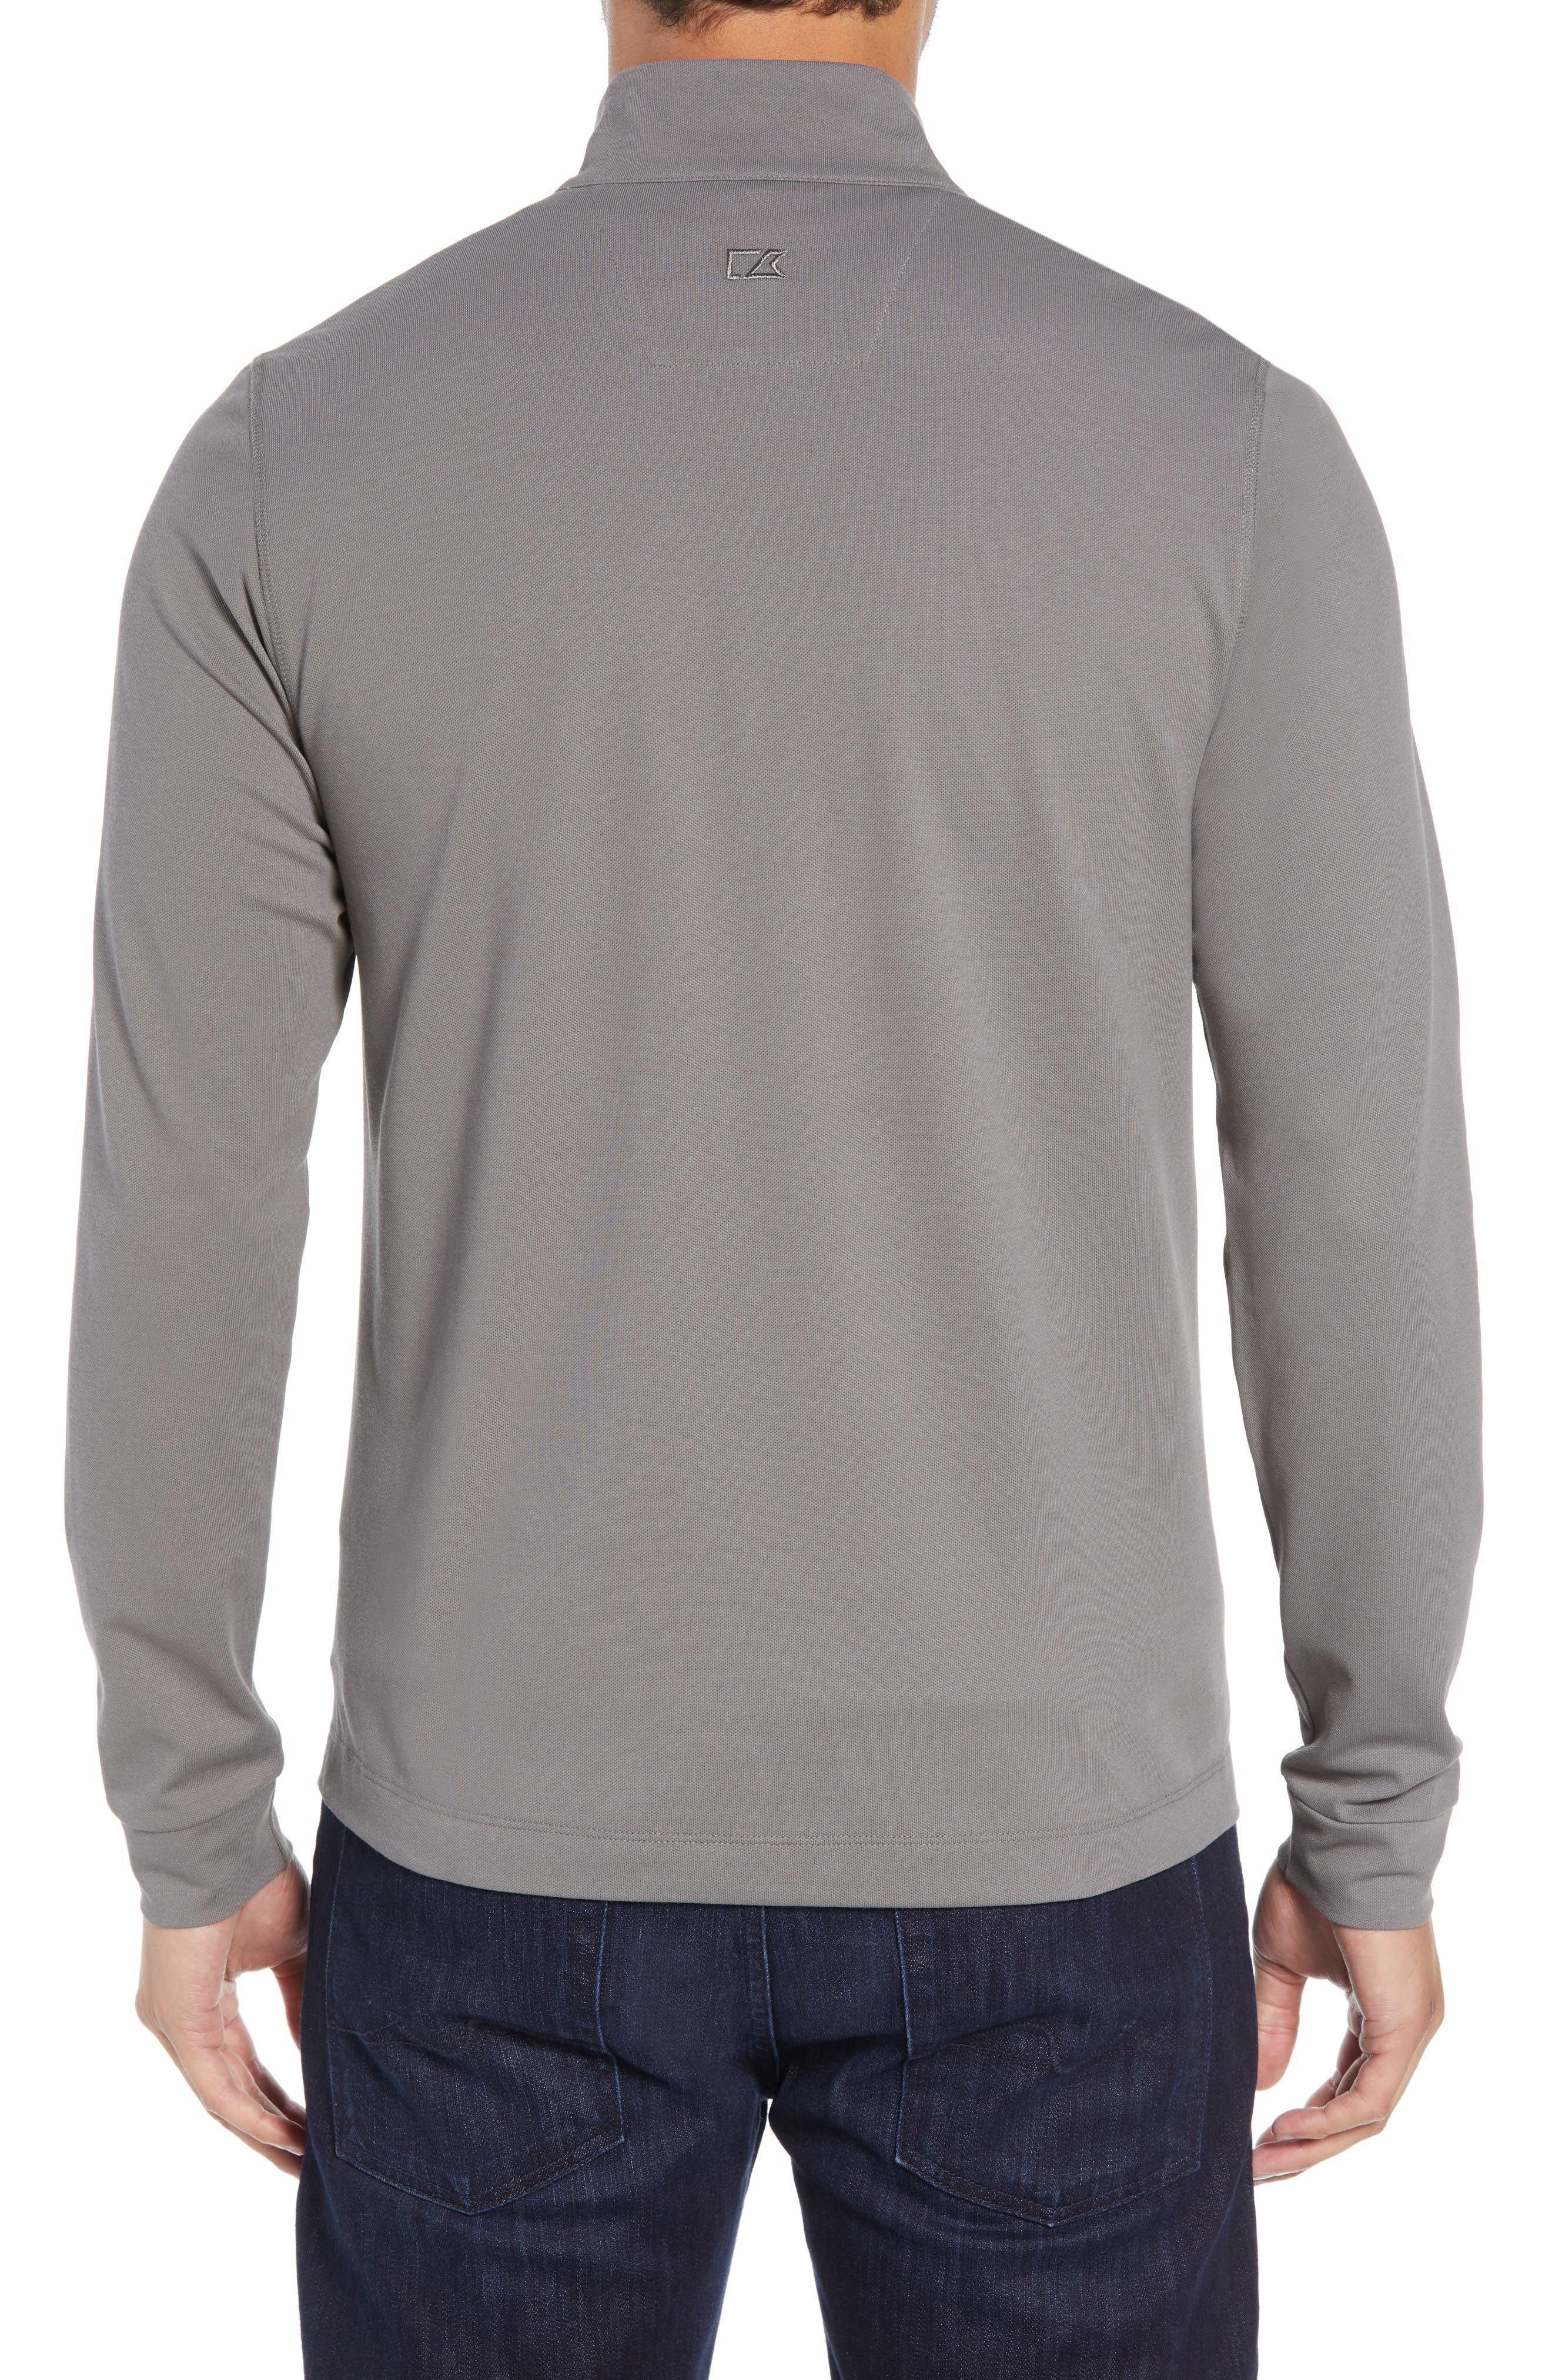 CUTTER & BUCK, Advantage Regular Fit DryTec Mock Neck Pullover, Alternate thumbnail 2, color, ELEMENTAL GREY